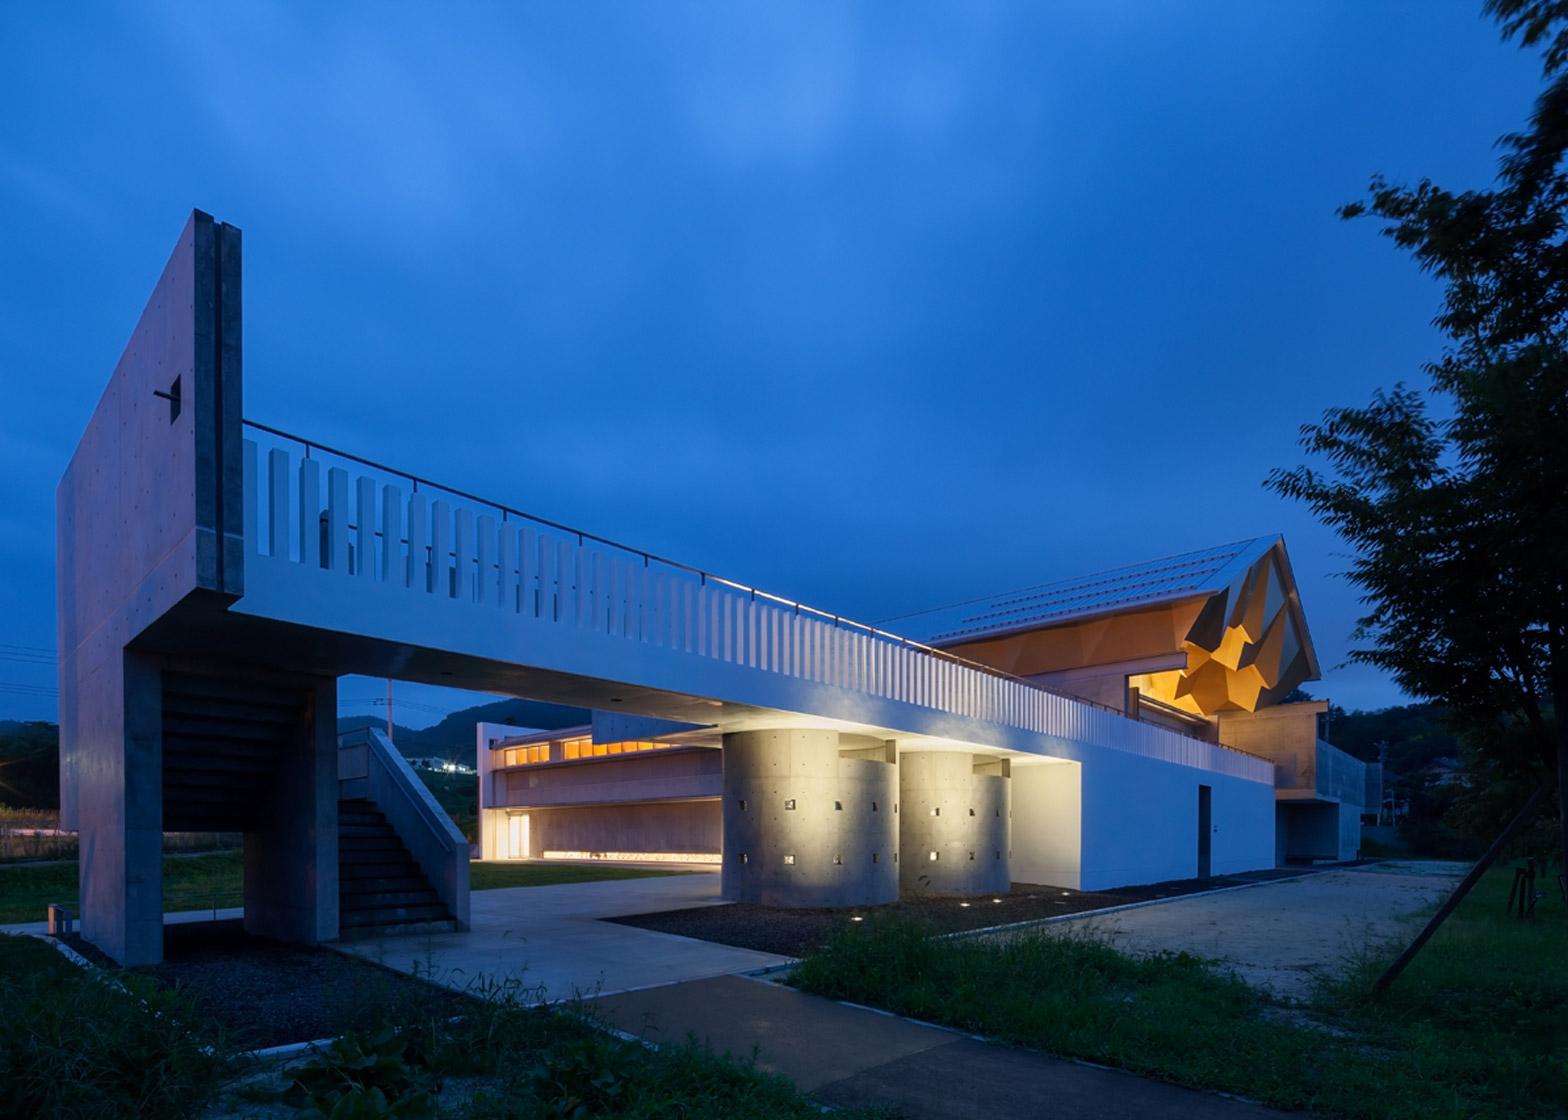 Miyahata Ruins Museum by Furuichi Architecture